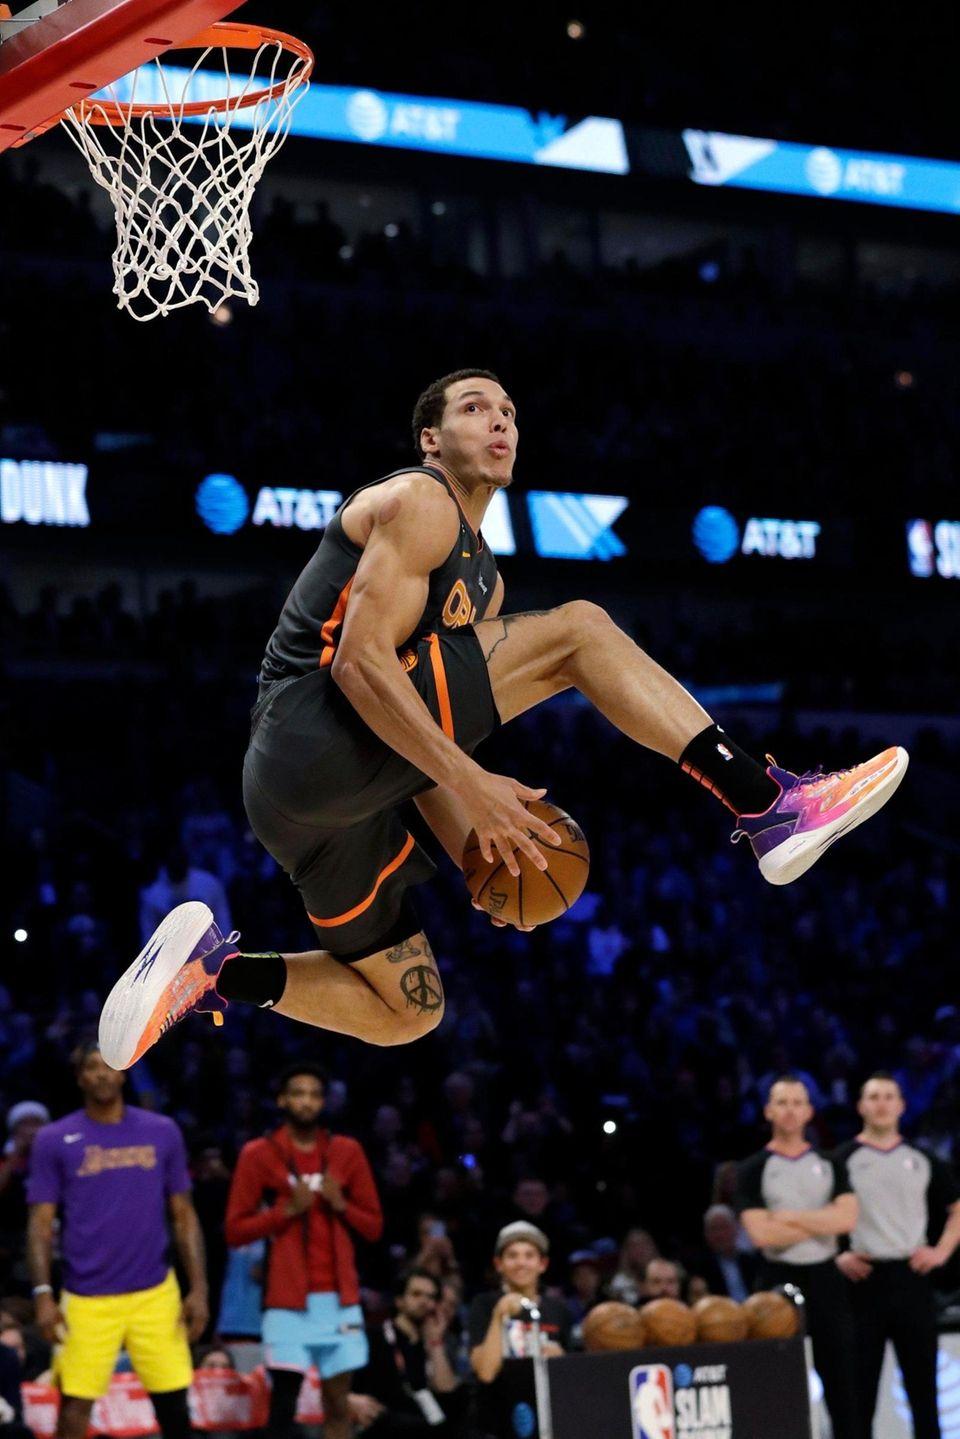 Orlando Magic's Aaron Gordon competes in the NBA